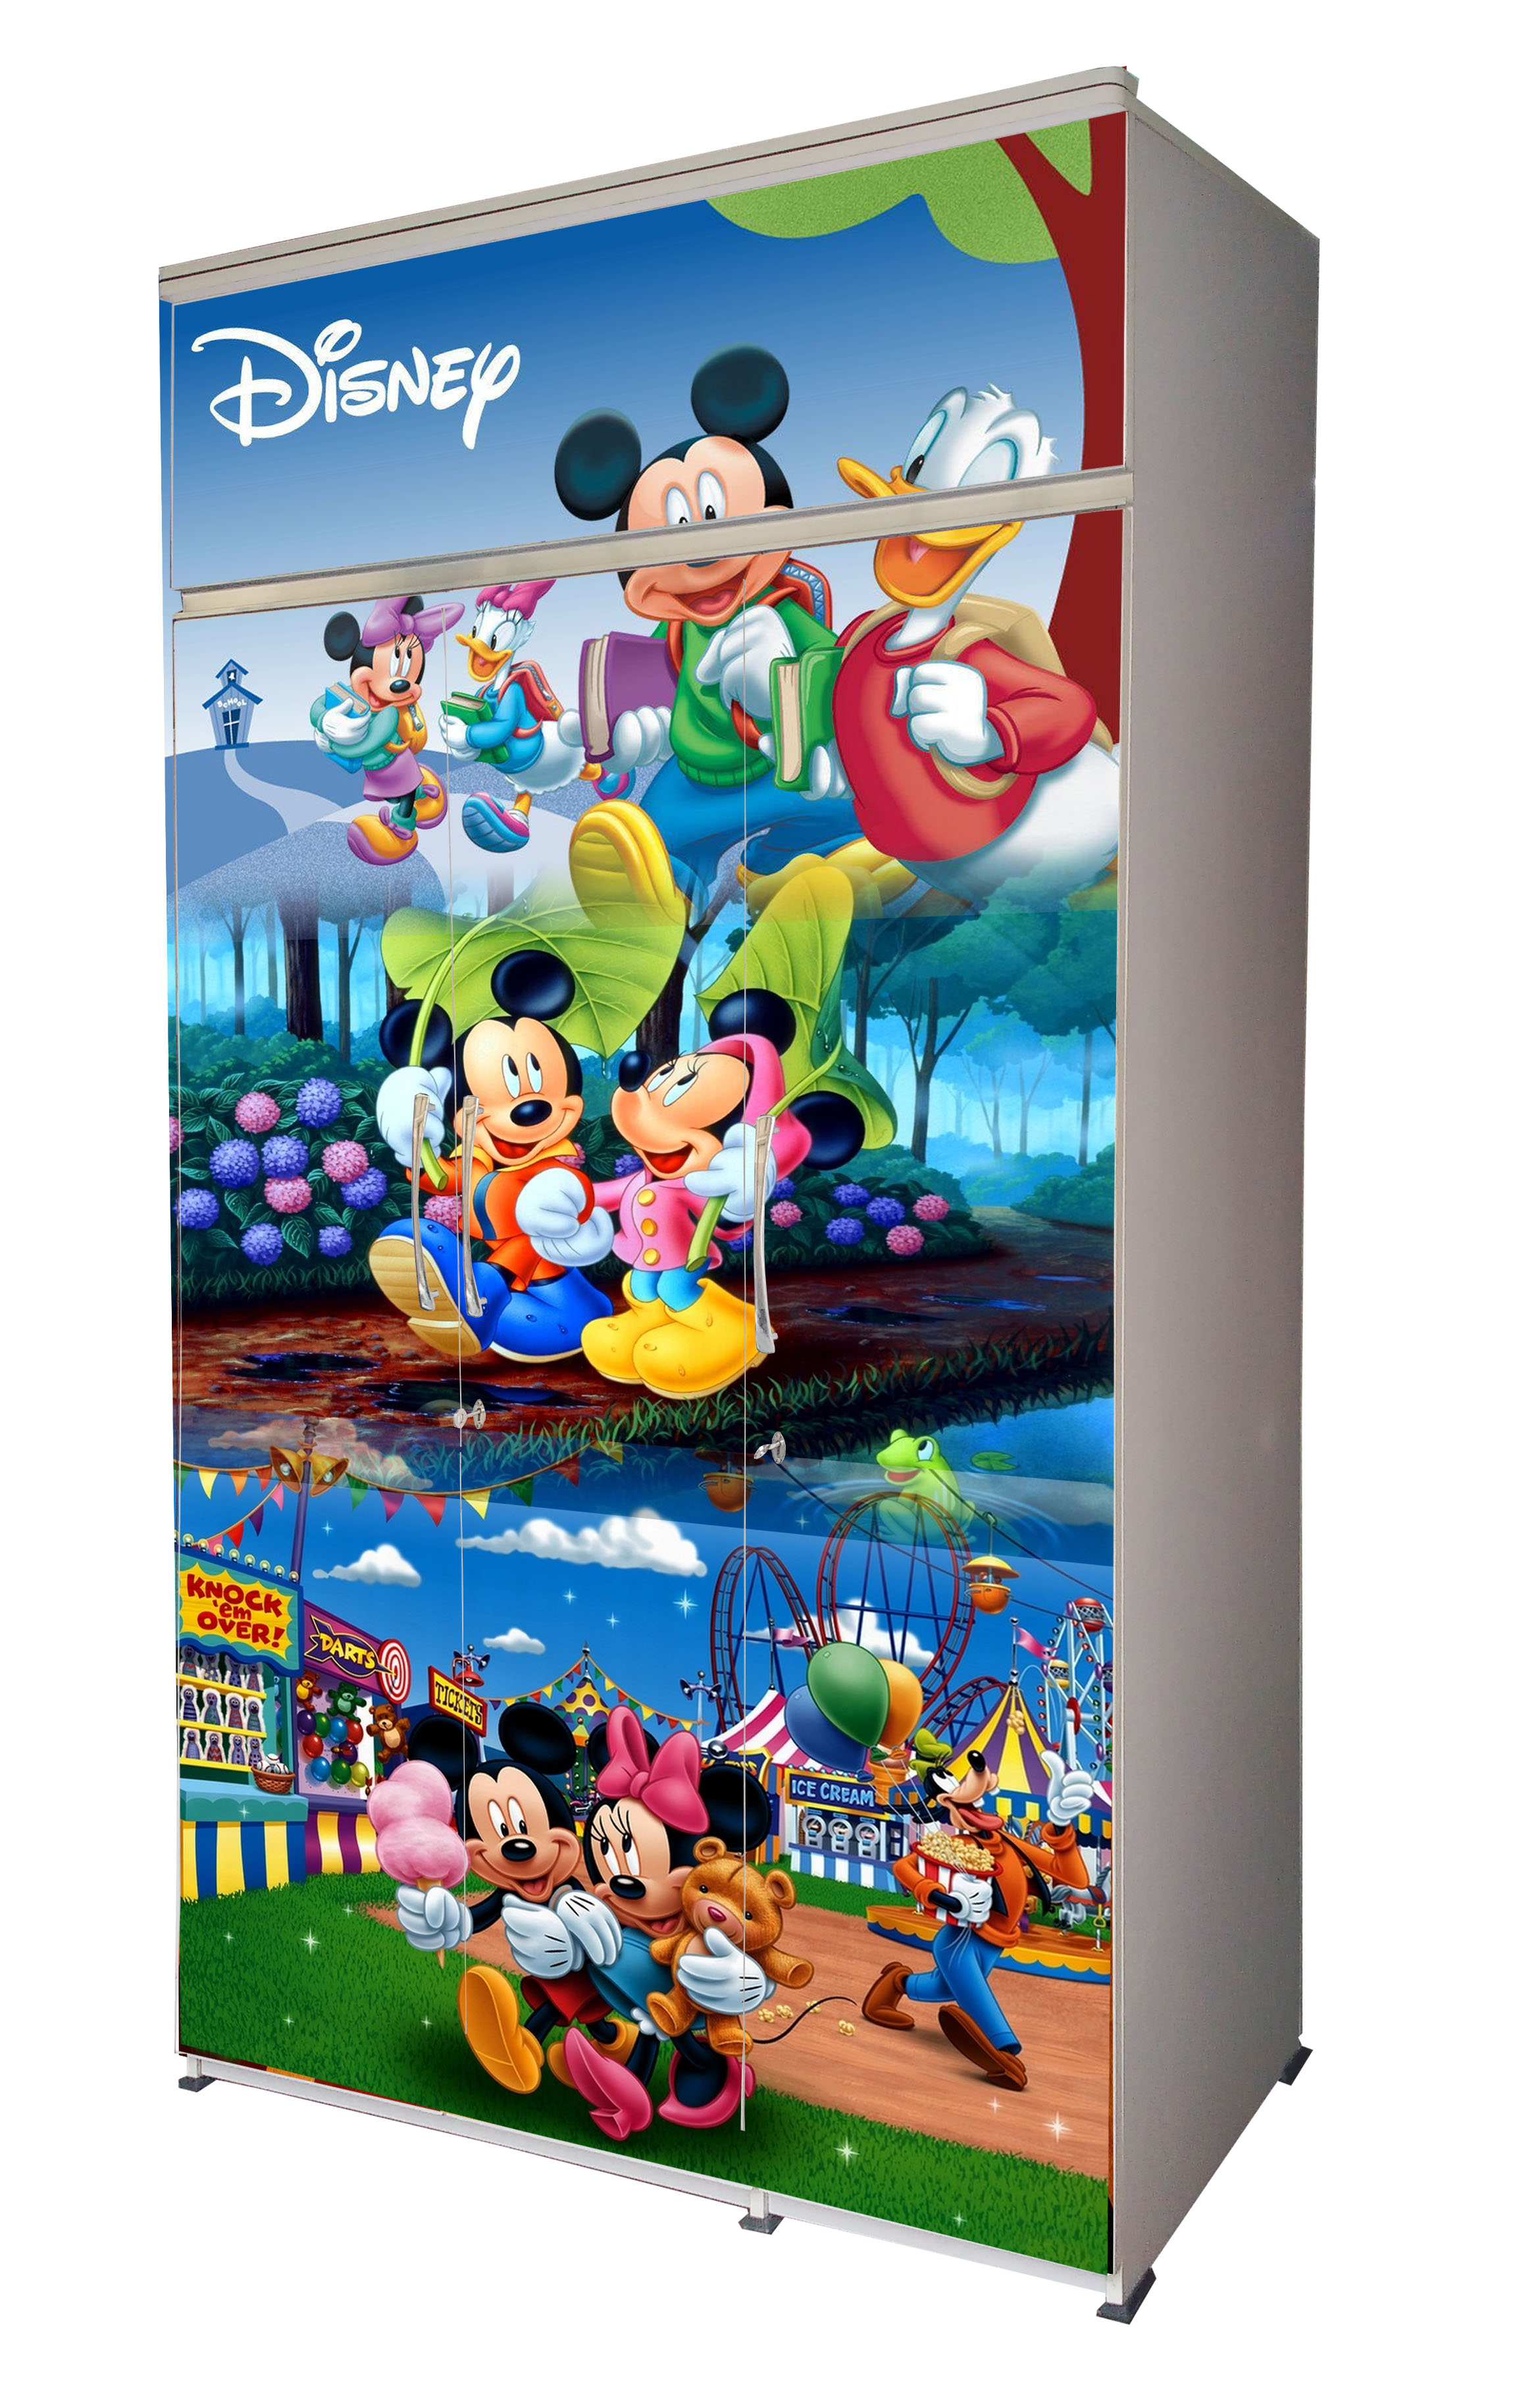 3D-01-Disney-SideView